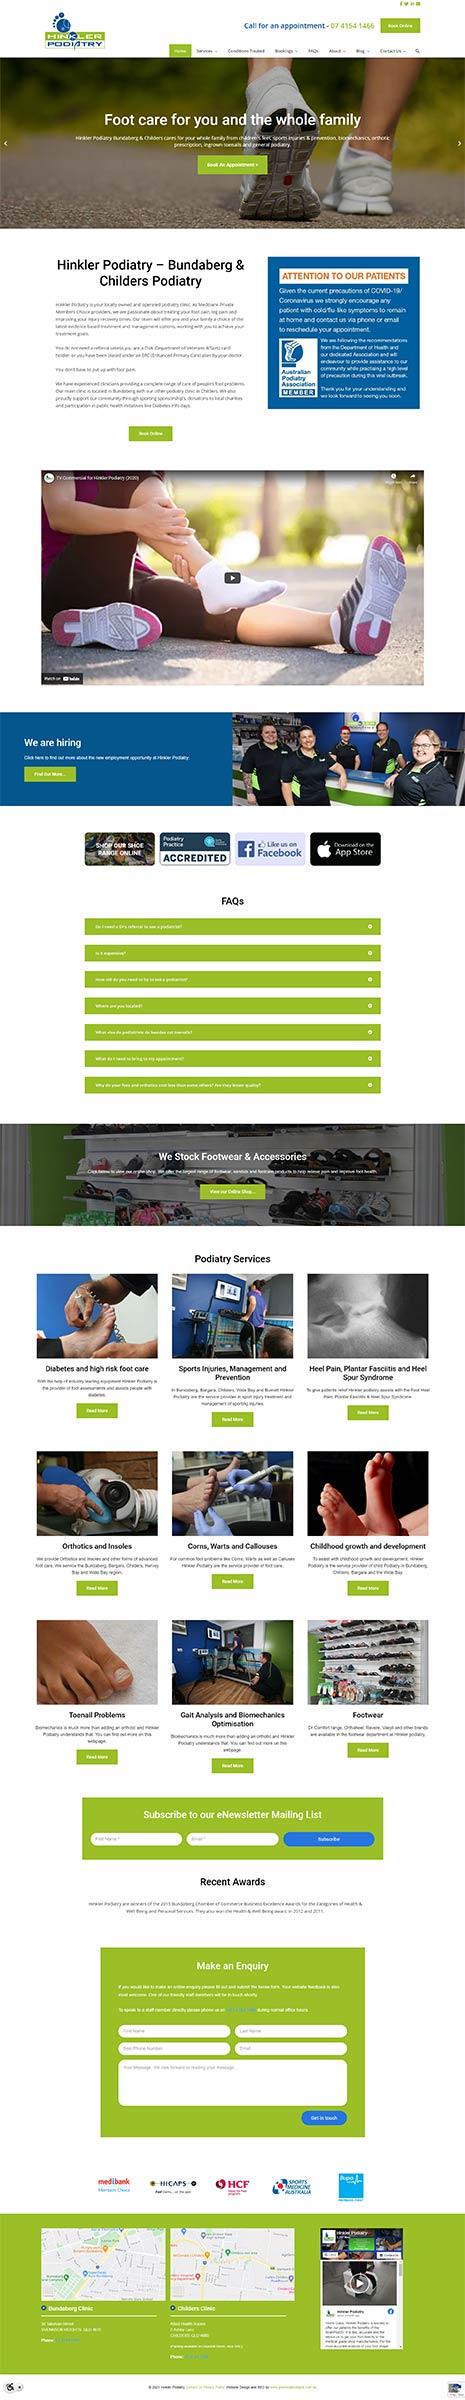 Hinkler Podiatry - new website